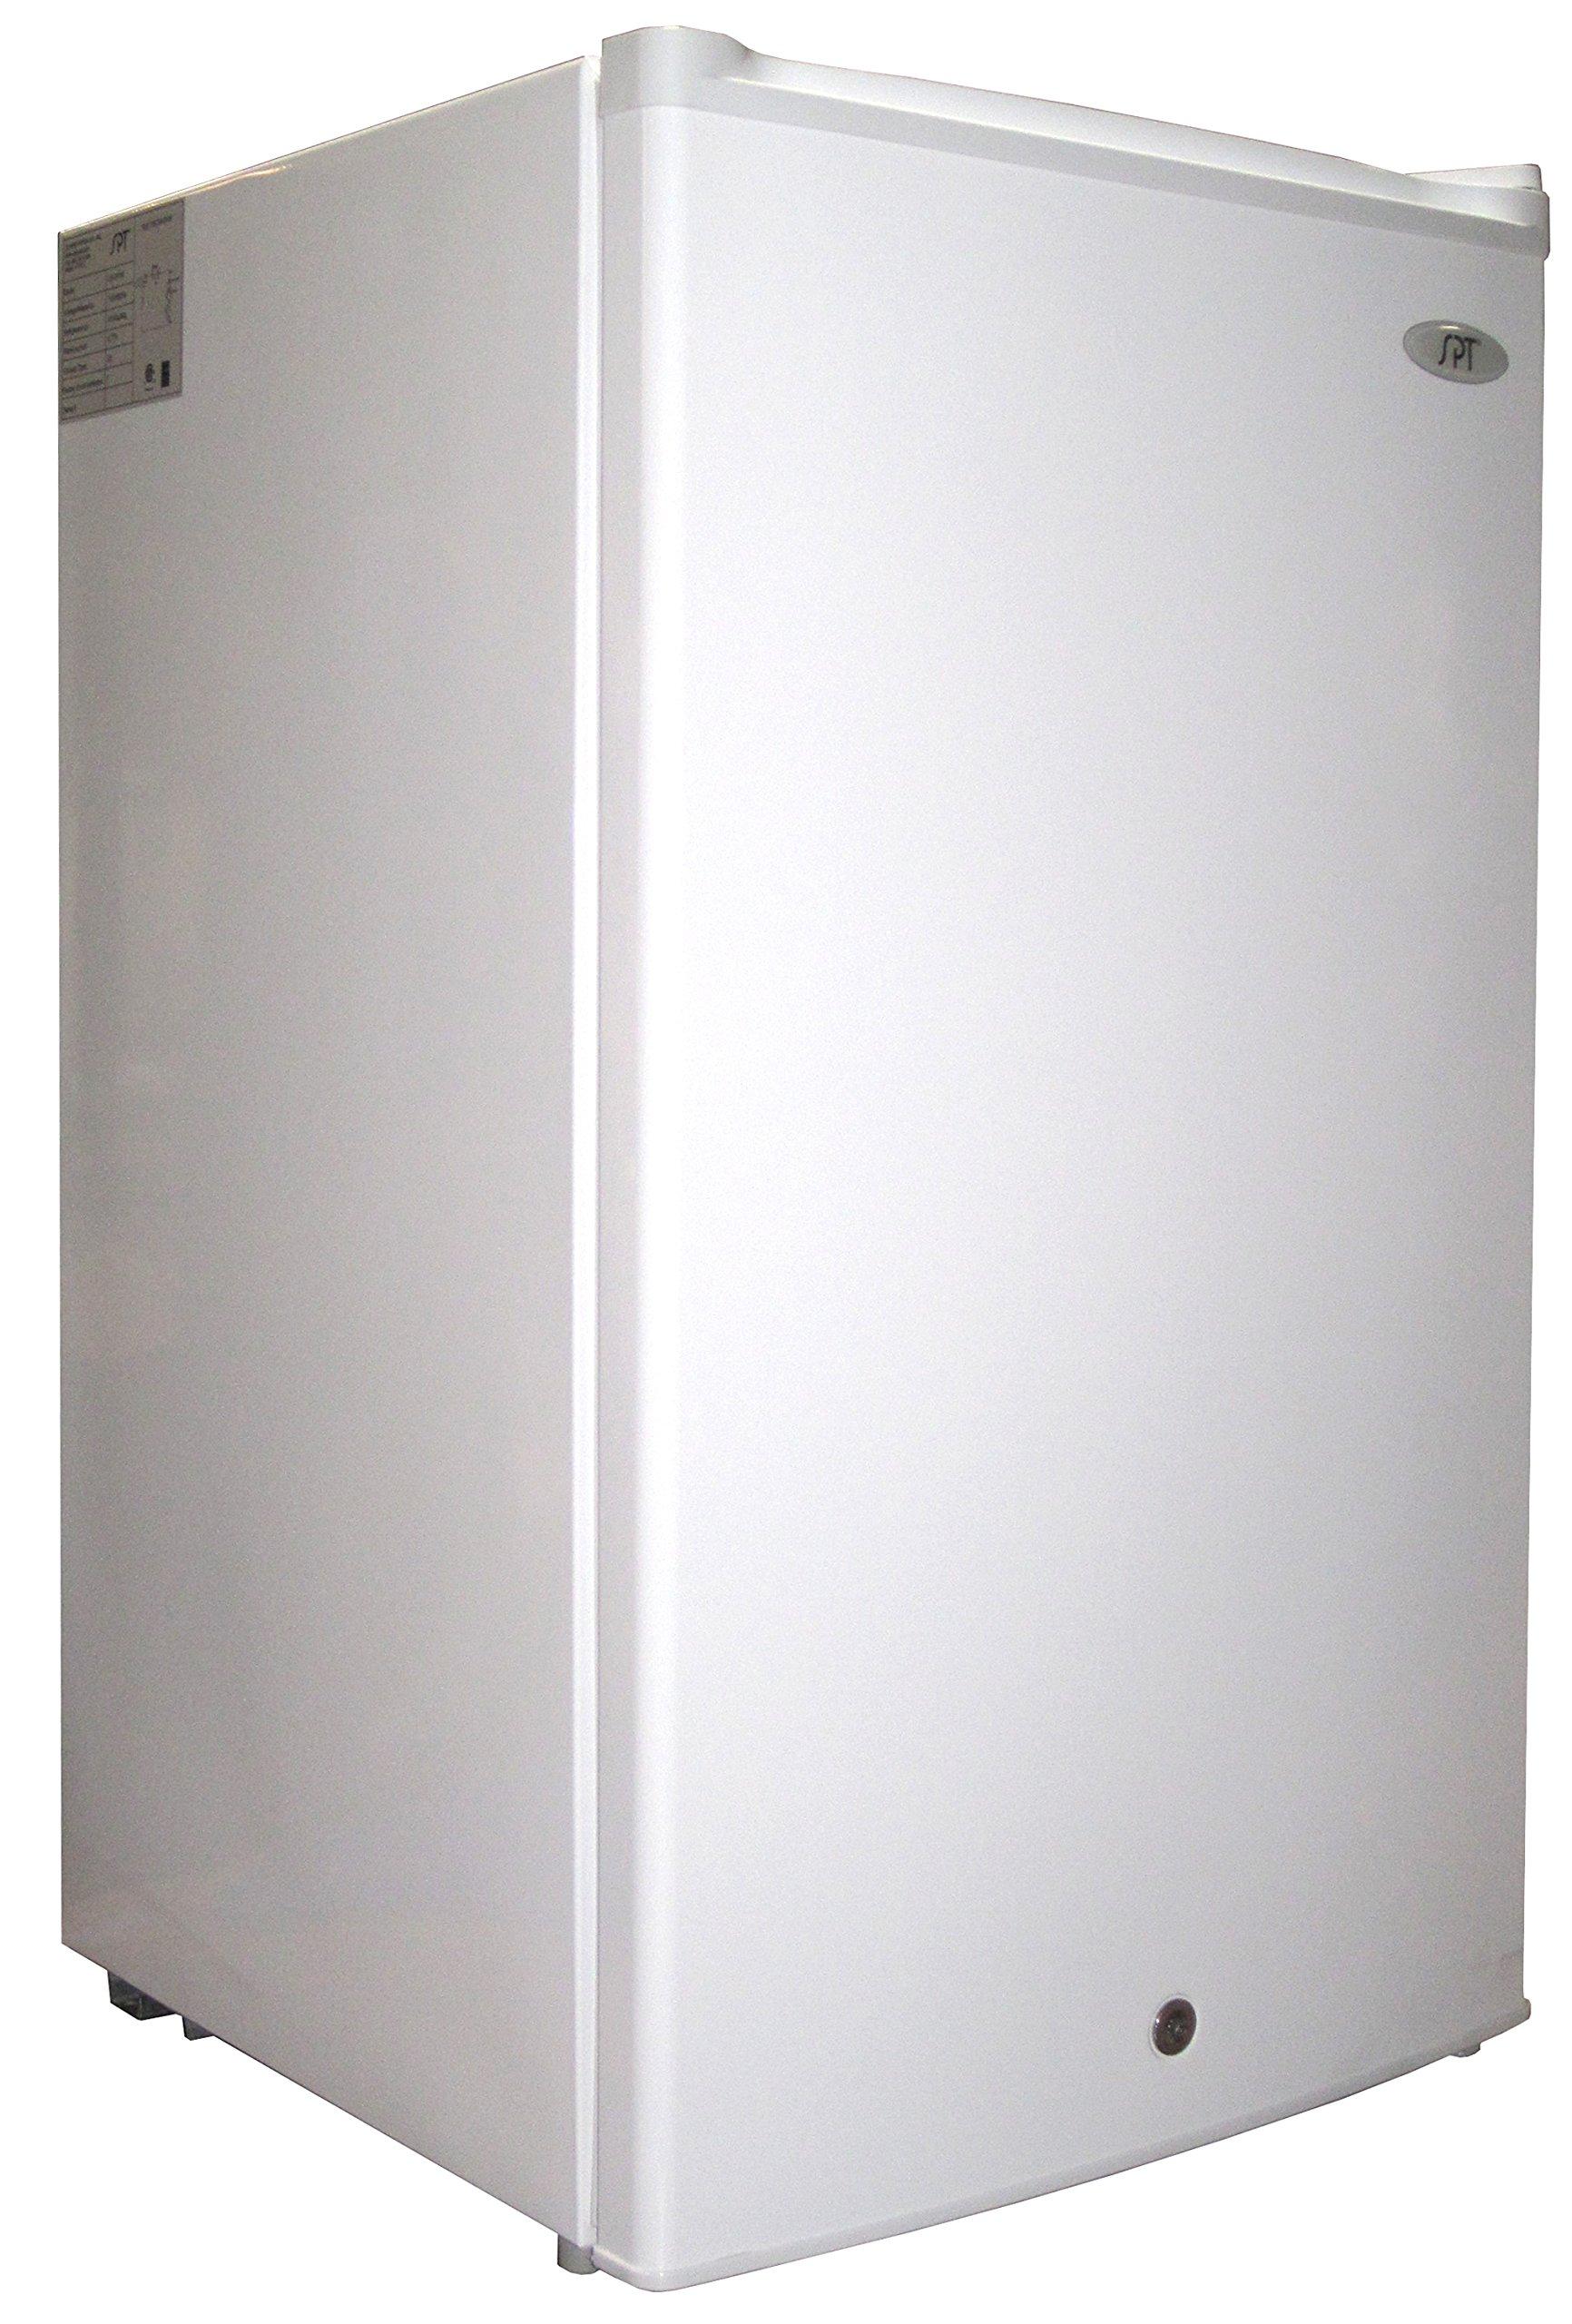 SPT UF-304W Energy Star Upright Freezer, 3.0 Cubic Feet, White by SPT